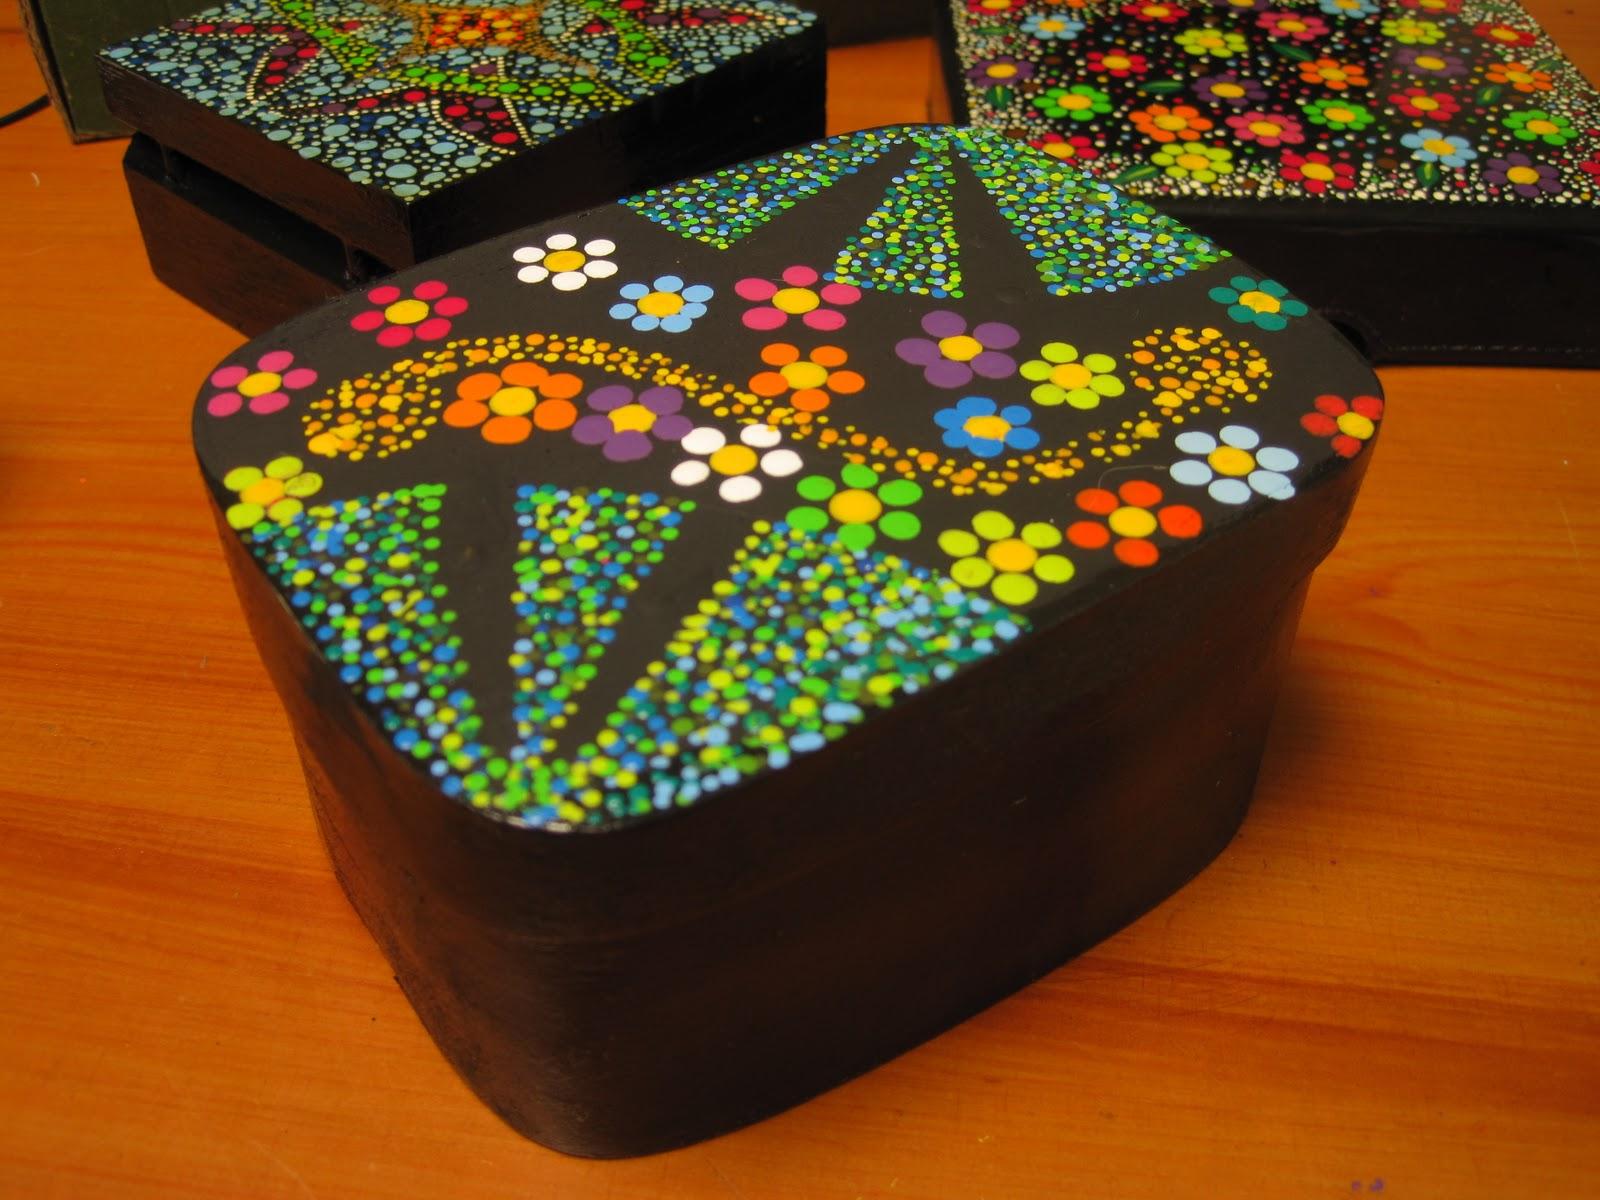 Manualidades abbad art armenia colombia cajas decorativas - Decorar cajas de madera manualidades ...